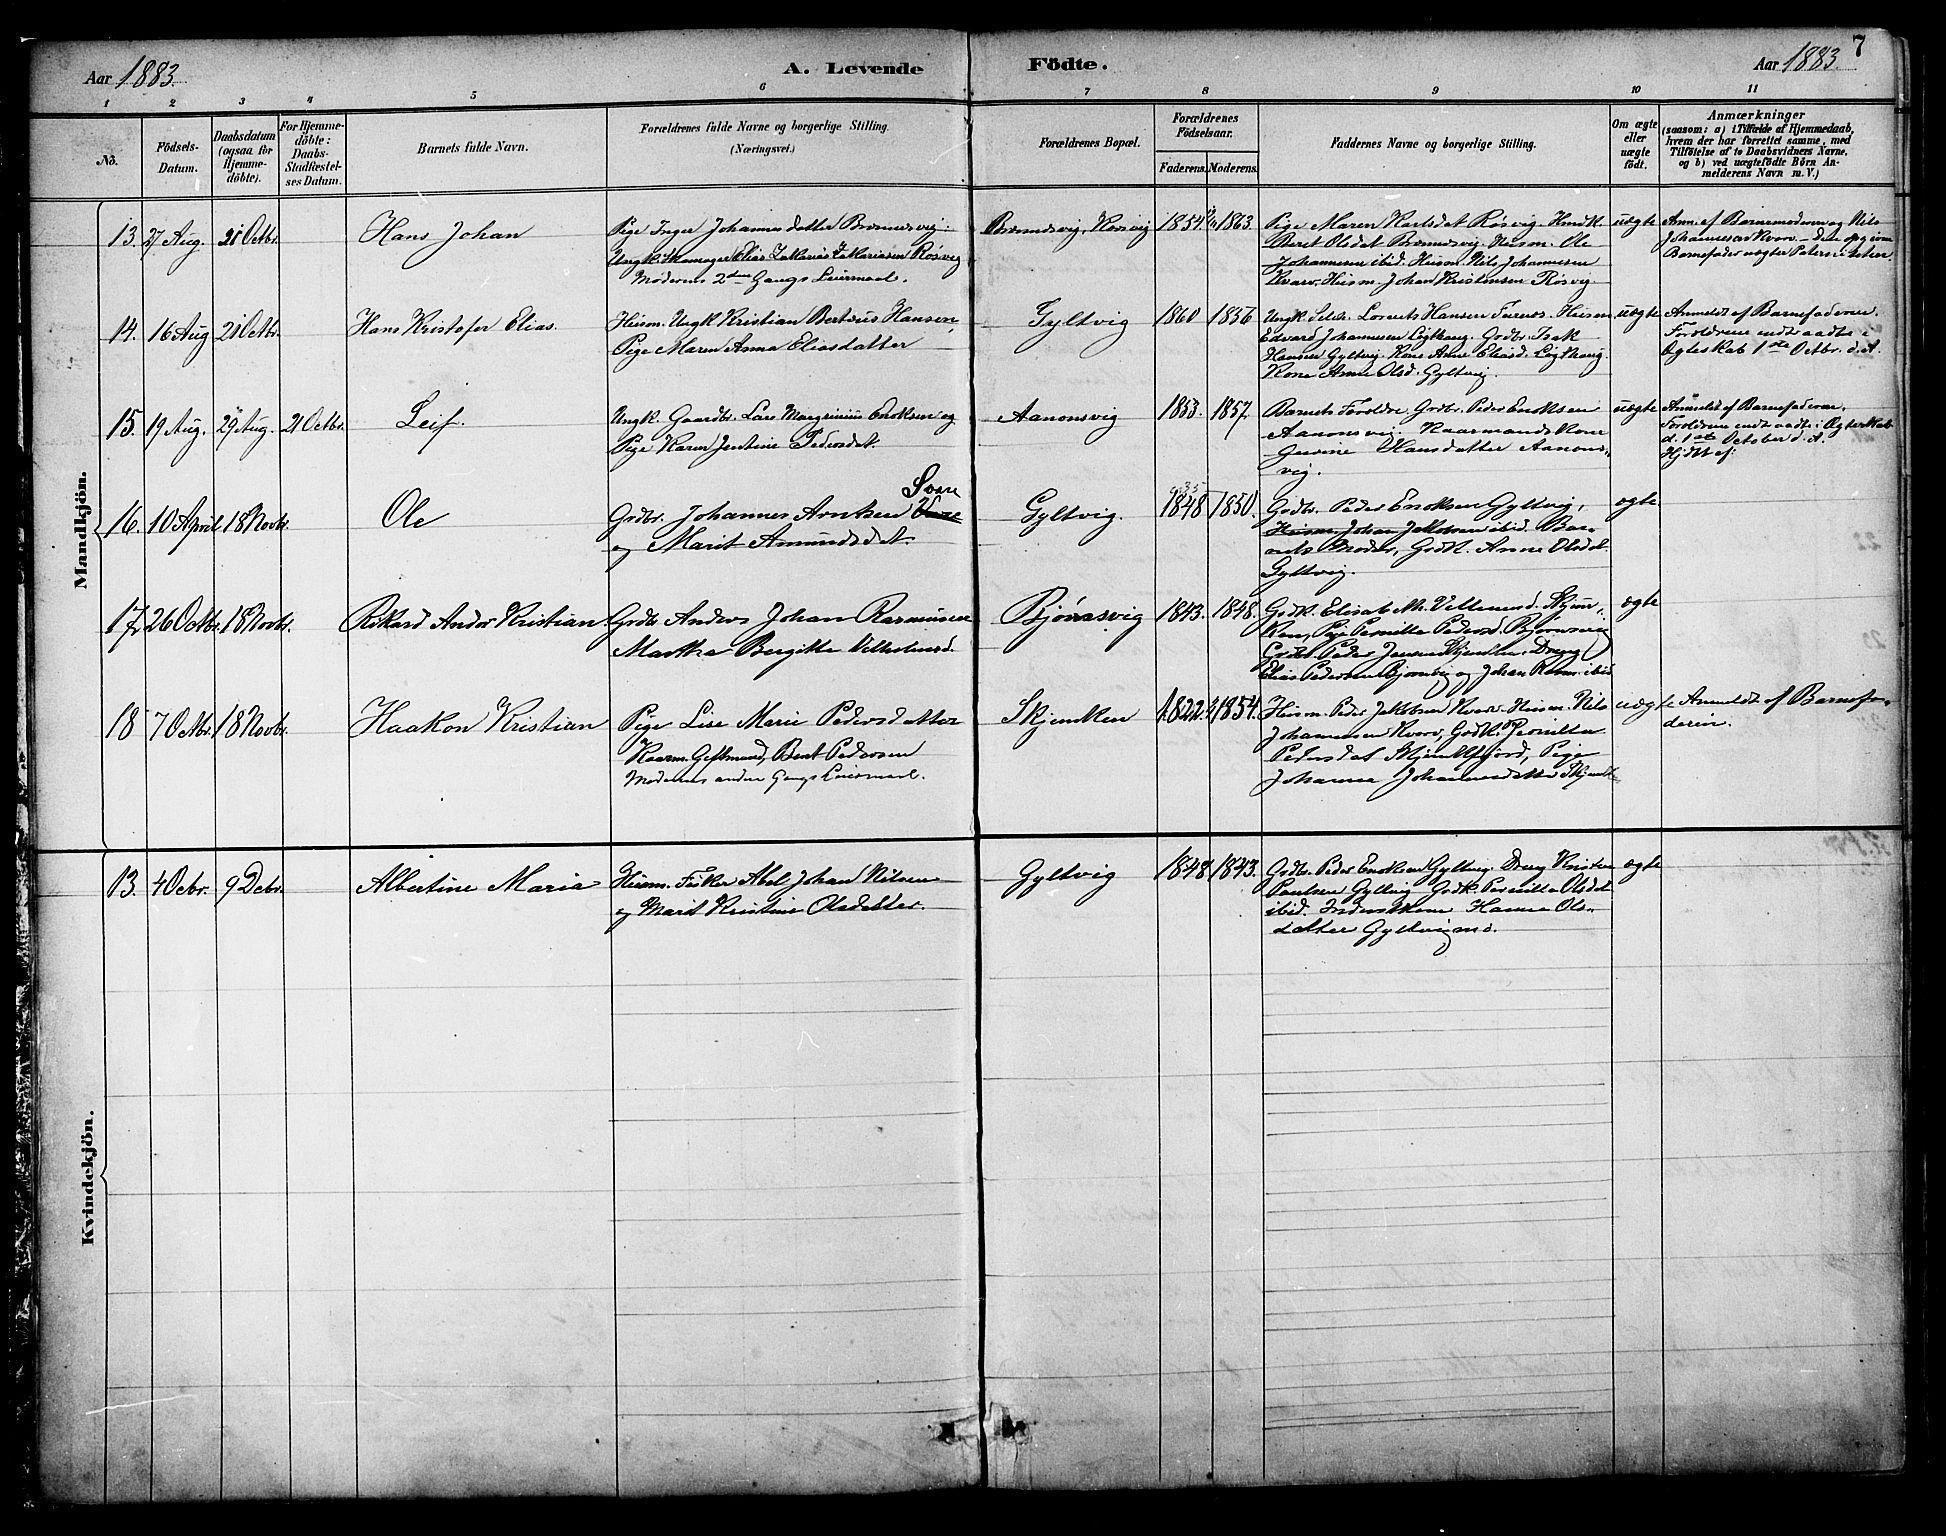 SAT, Ministerialprotokoller, klokkerbøker og fødselsregistre - Nordland, 854/L0777: Ministerialbok nr. 854A01 /1, 1883-1891, s. 7